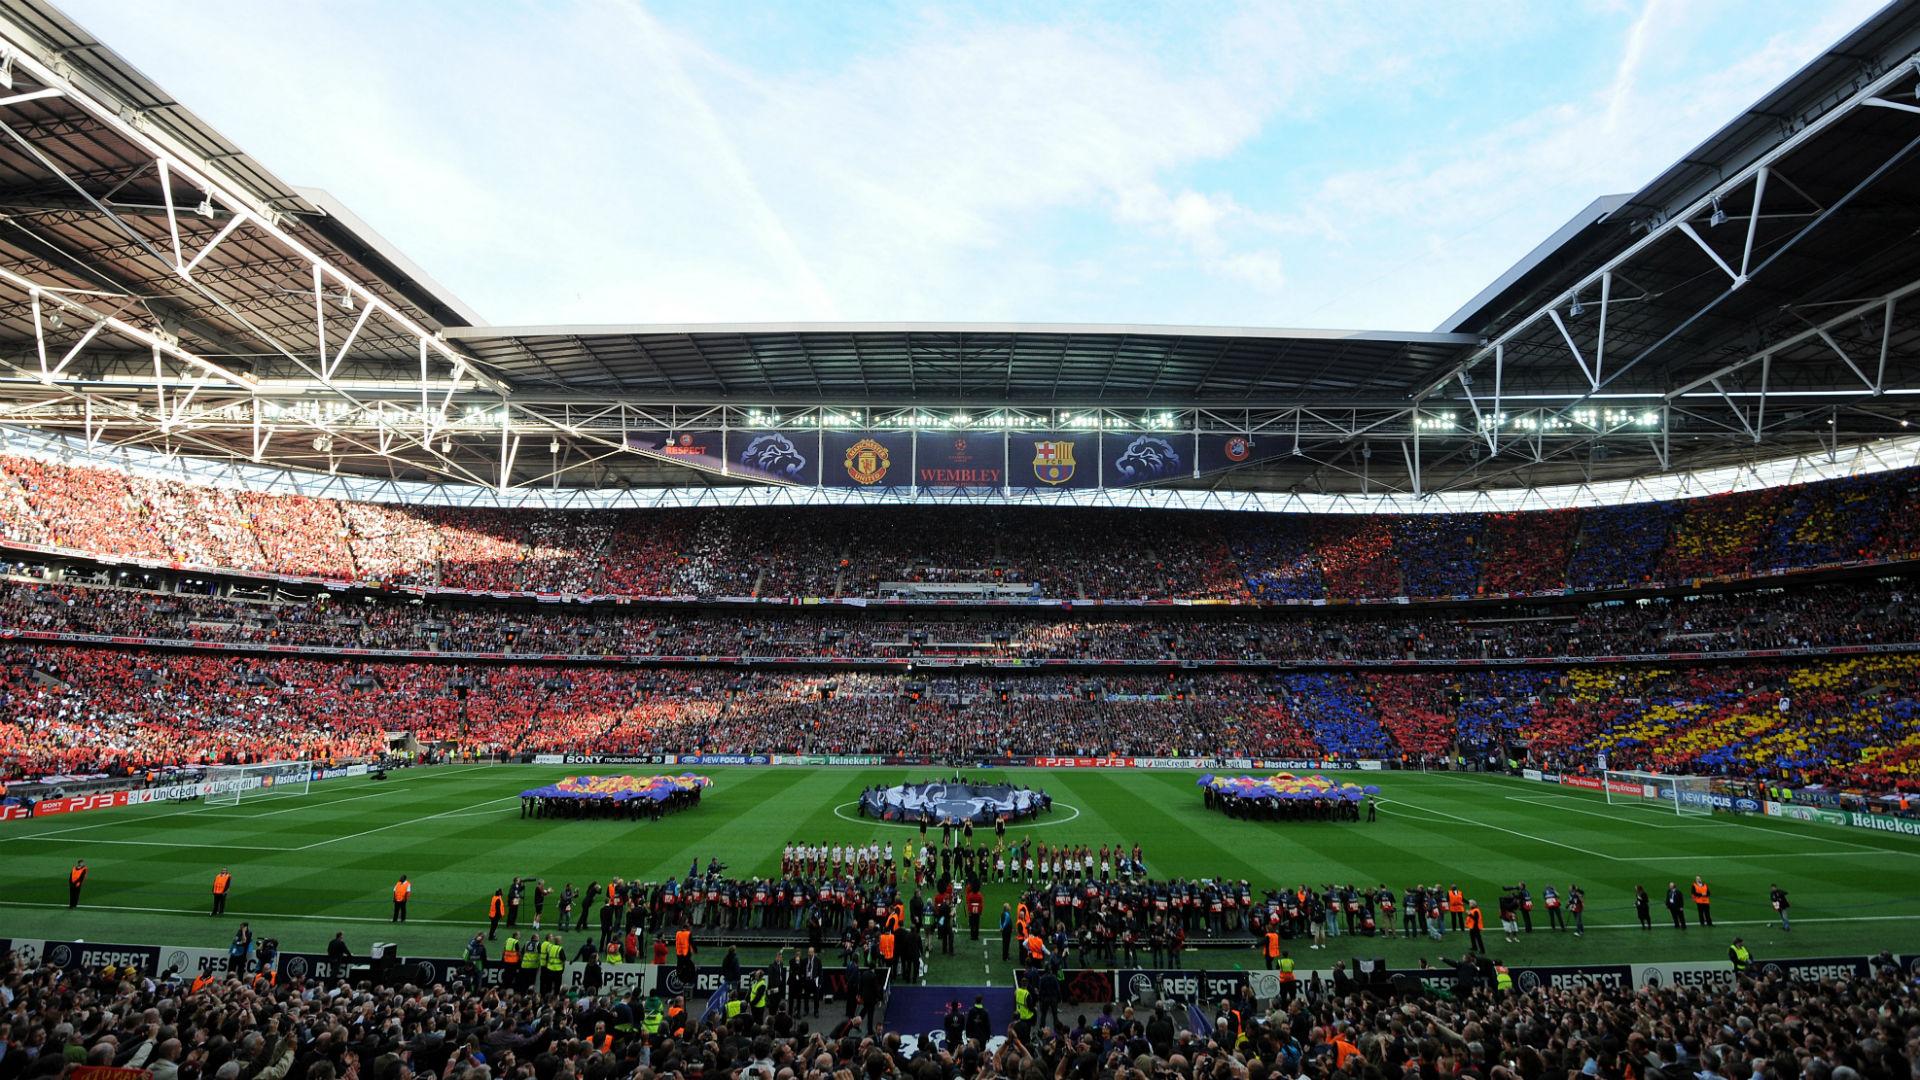 Wembley general view